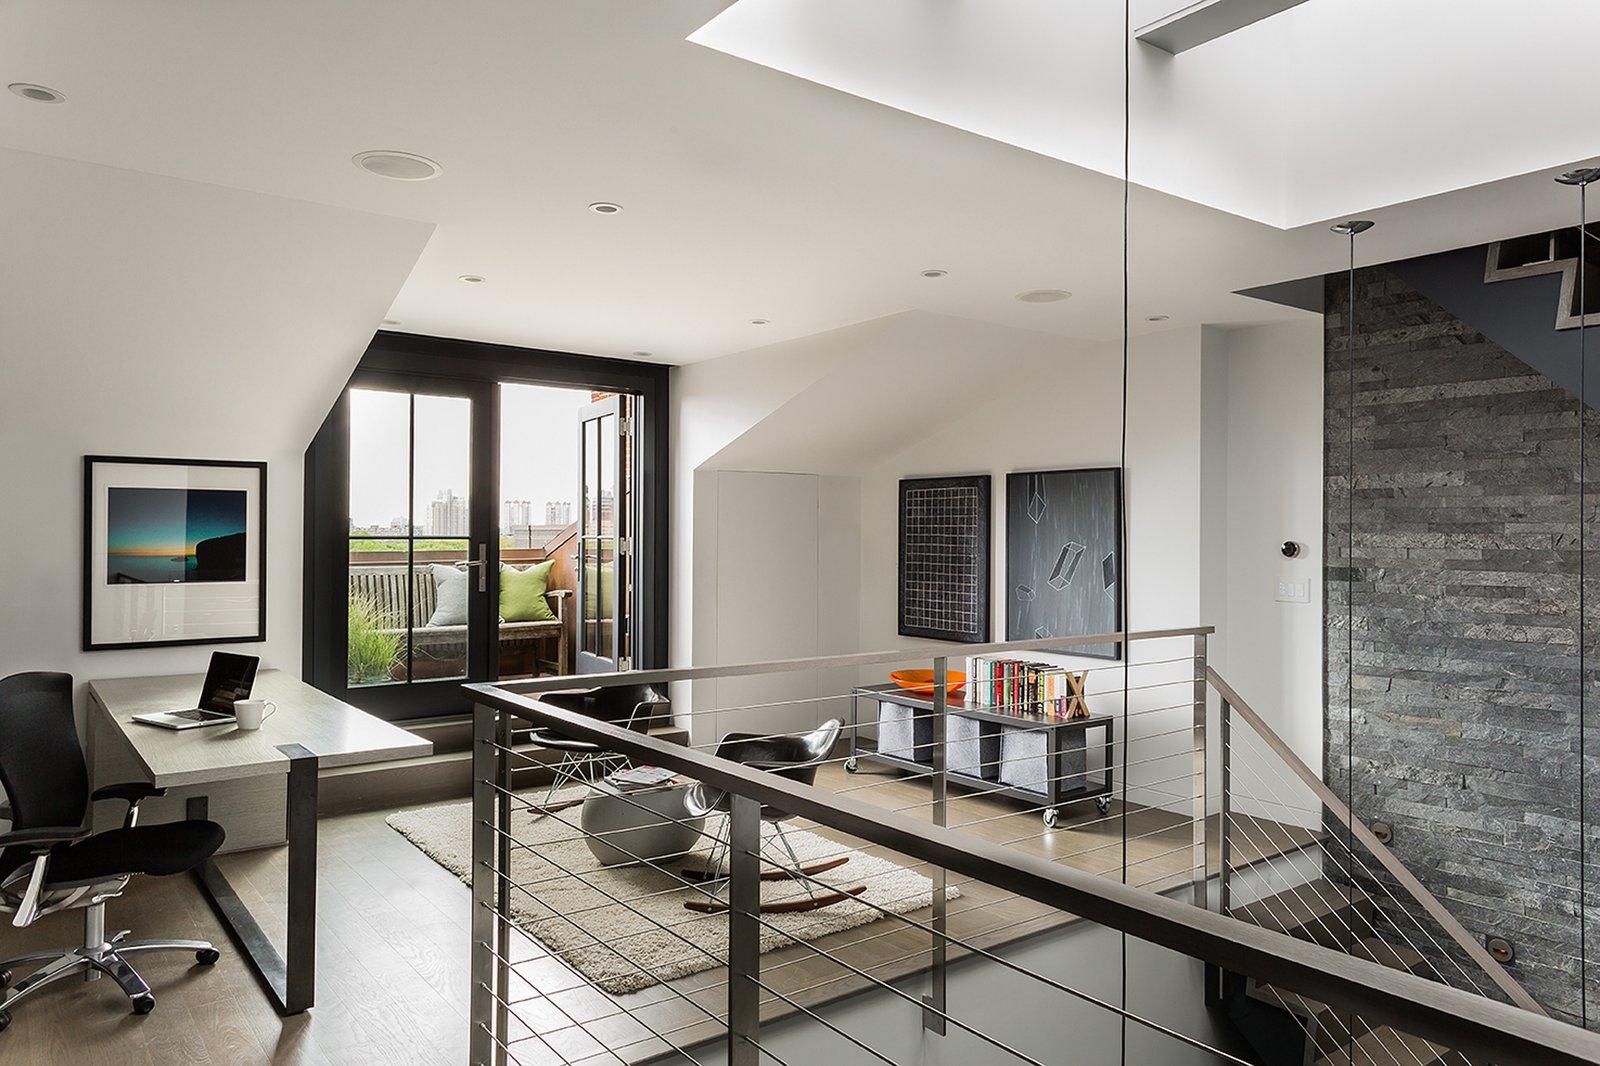 Atrium House by Ruhl Walker Architects